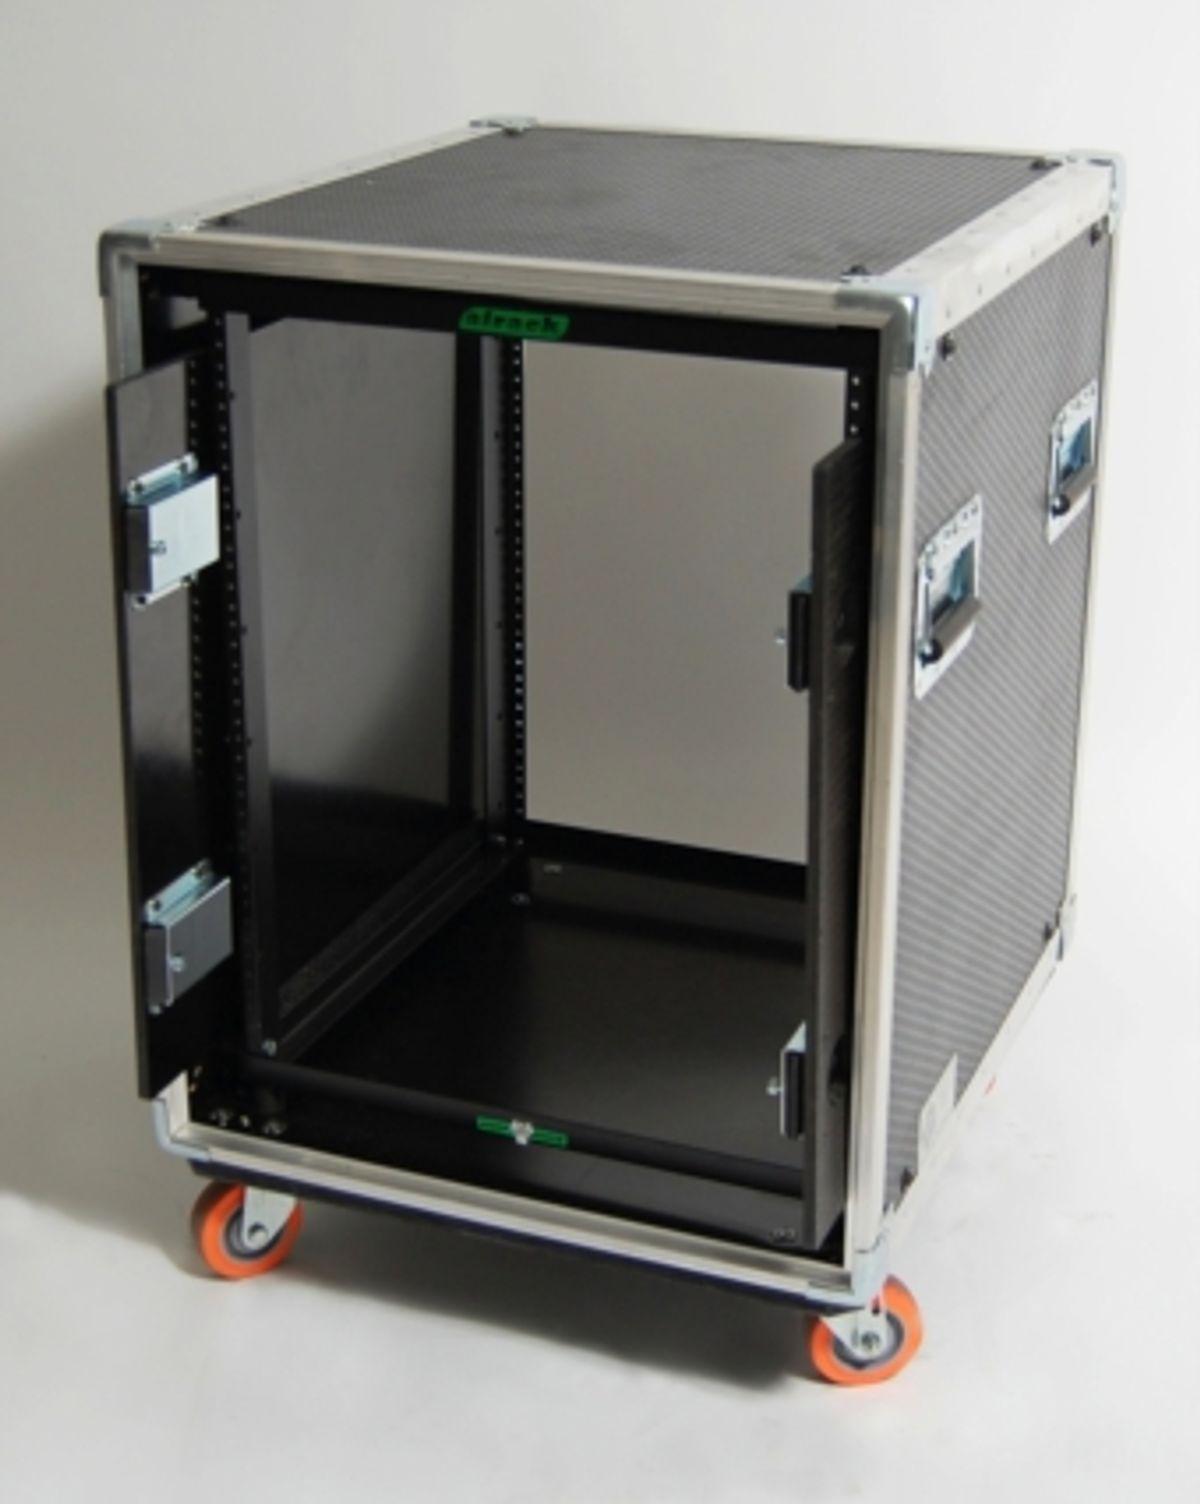 A&S Introduces SLAM Racks and Cases